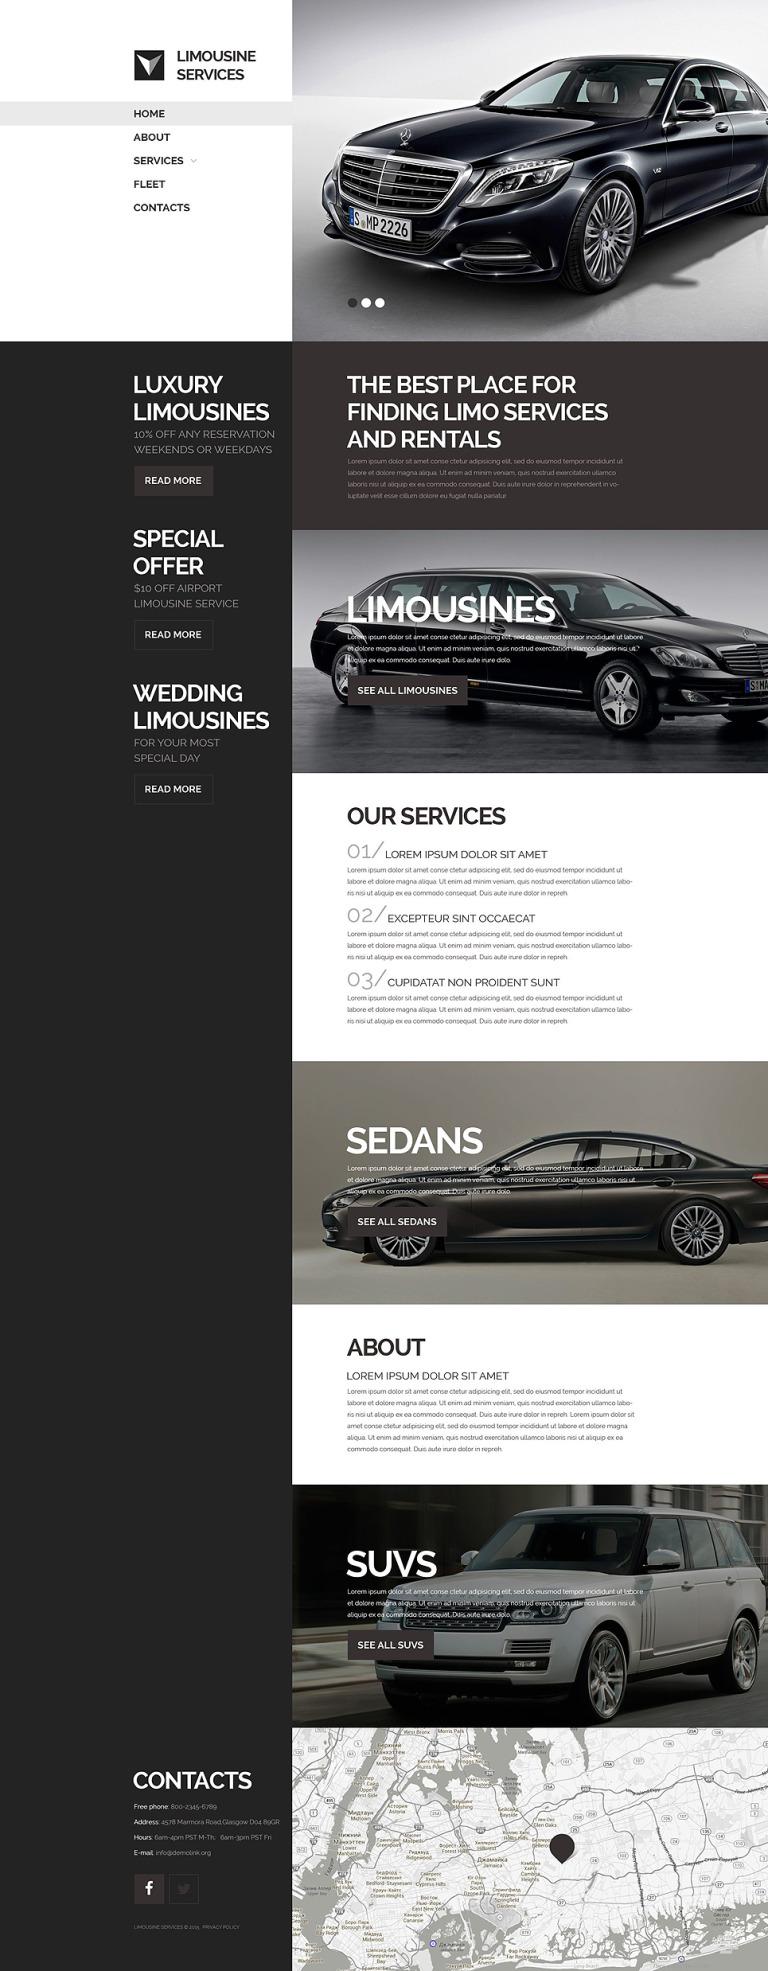 Limo Transportation Website Template New Screenshots BIG